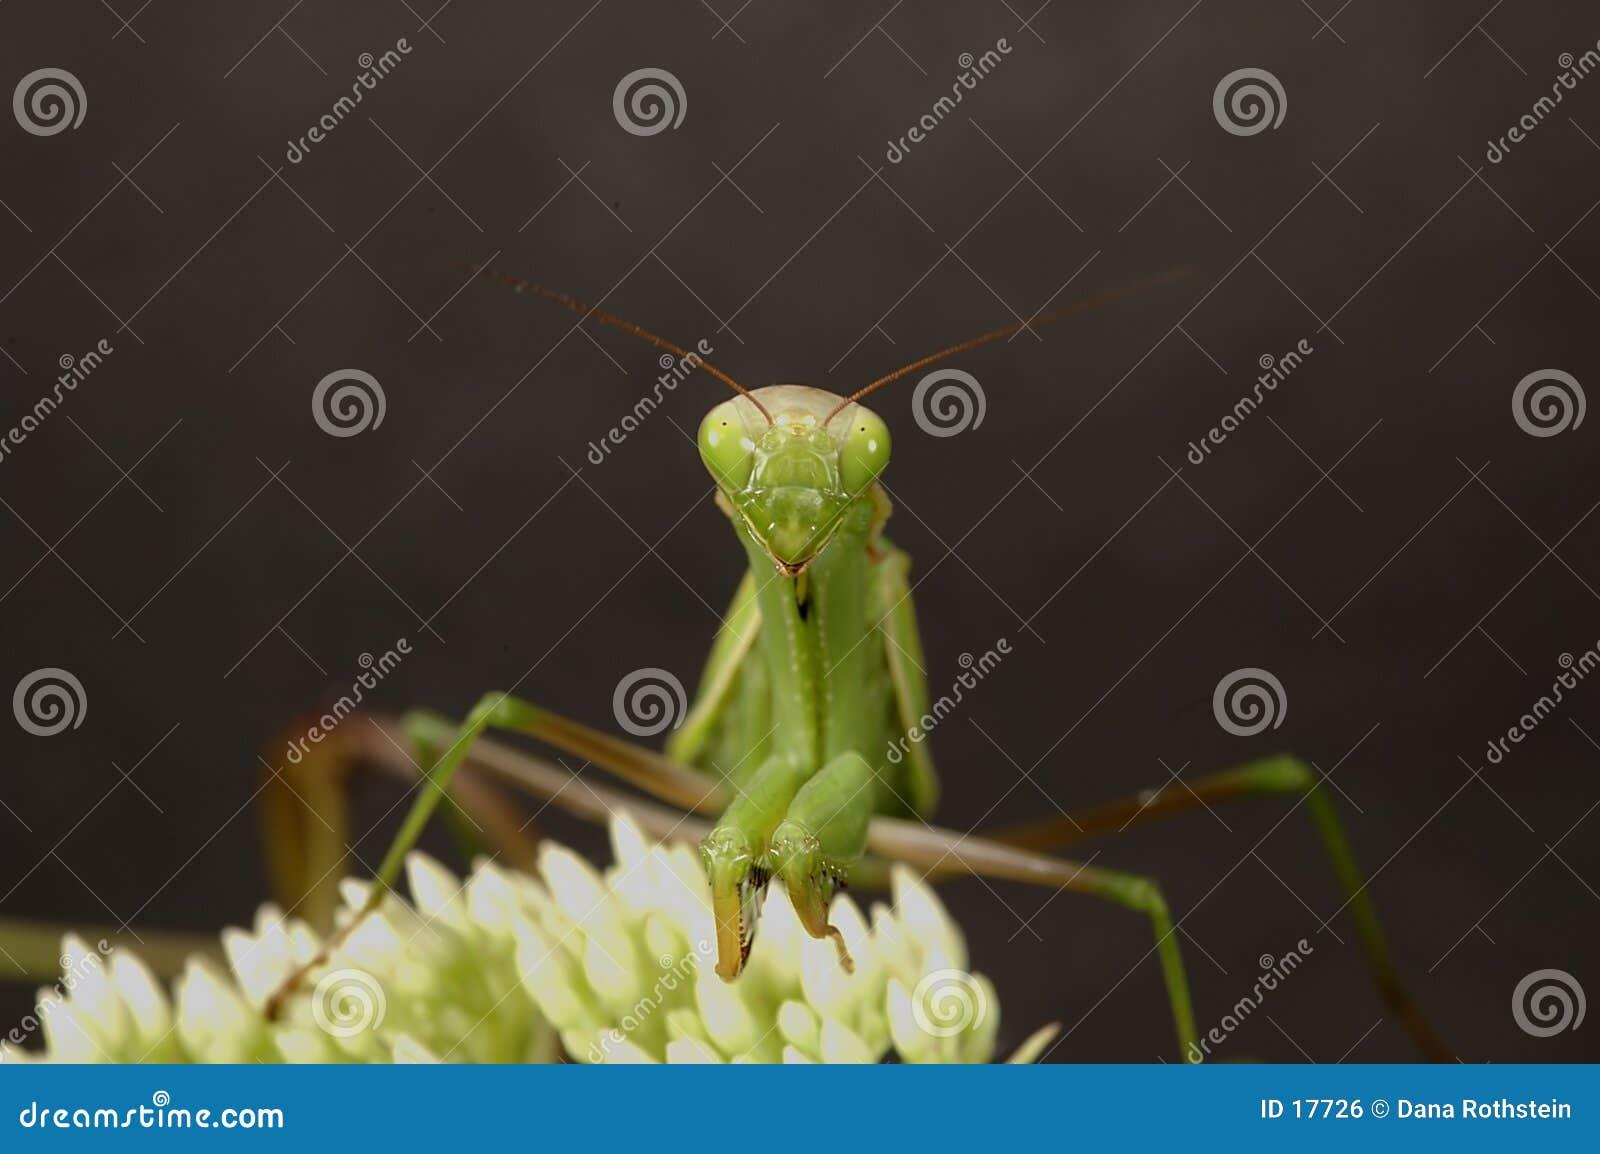 Preying Mantis 2